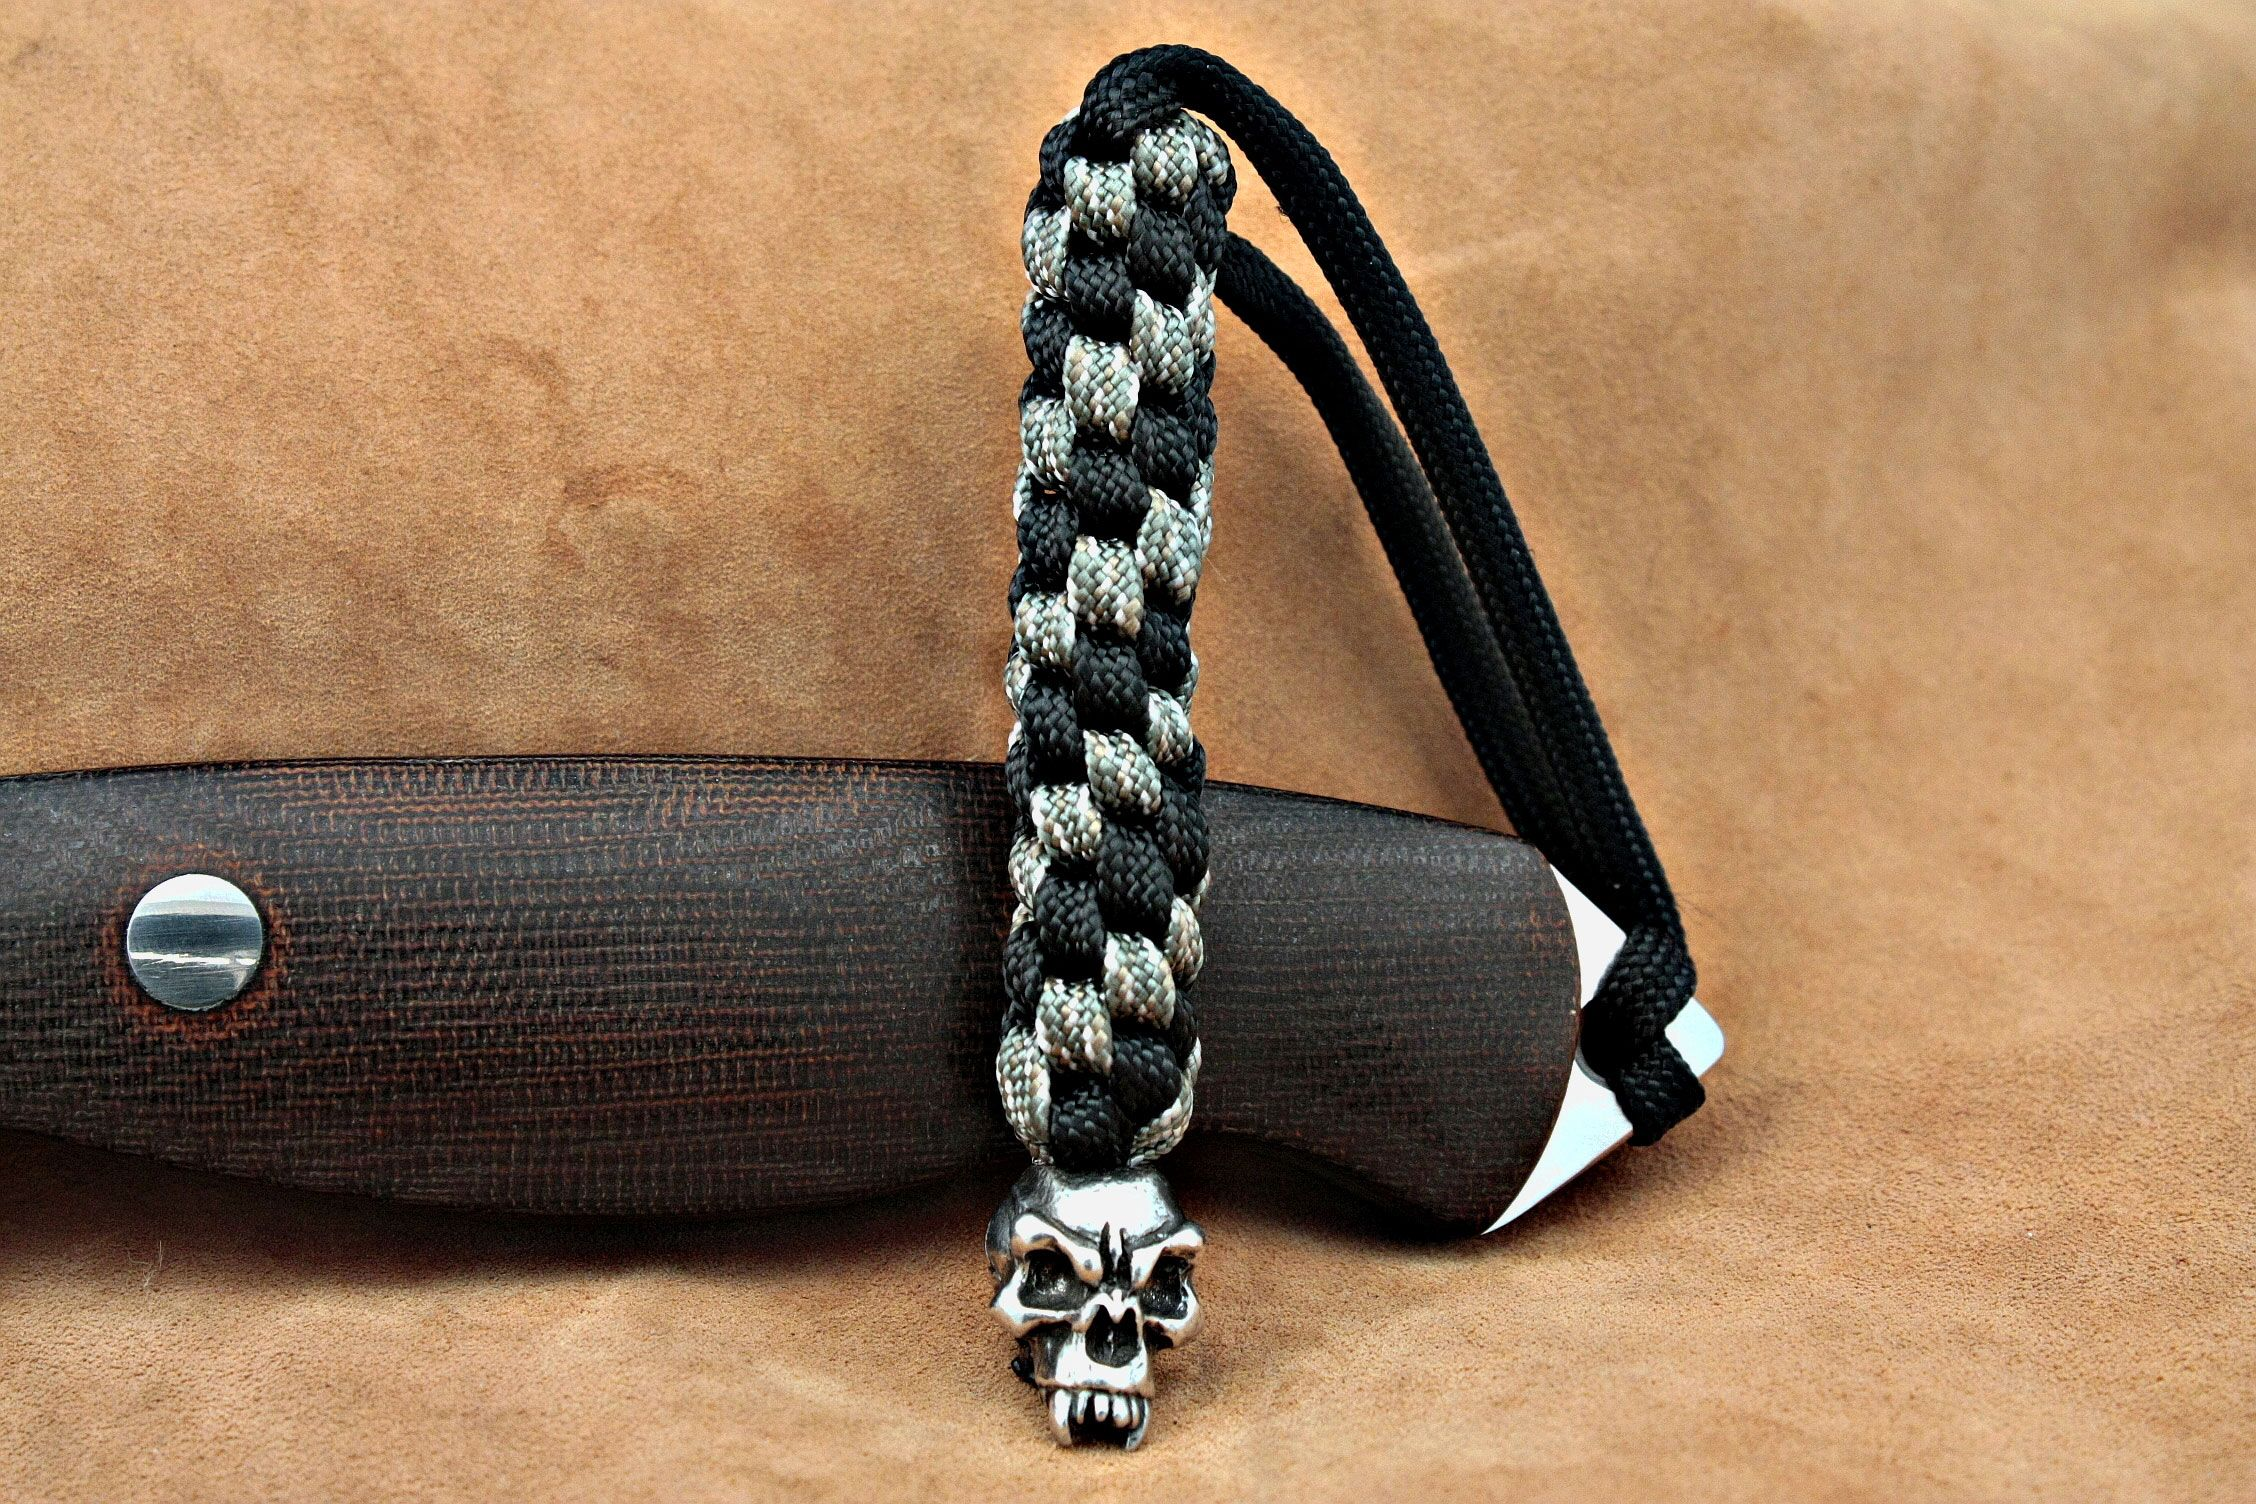 Schmuckatelli Pewter Fang Skull Lanyard, Black/Camo